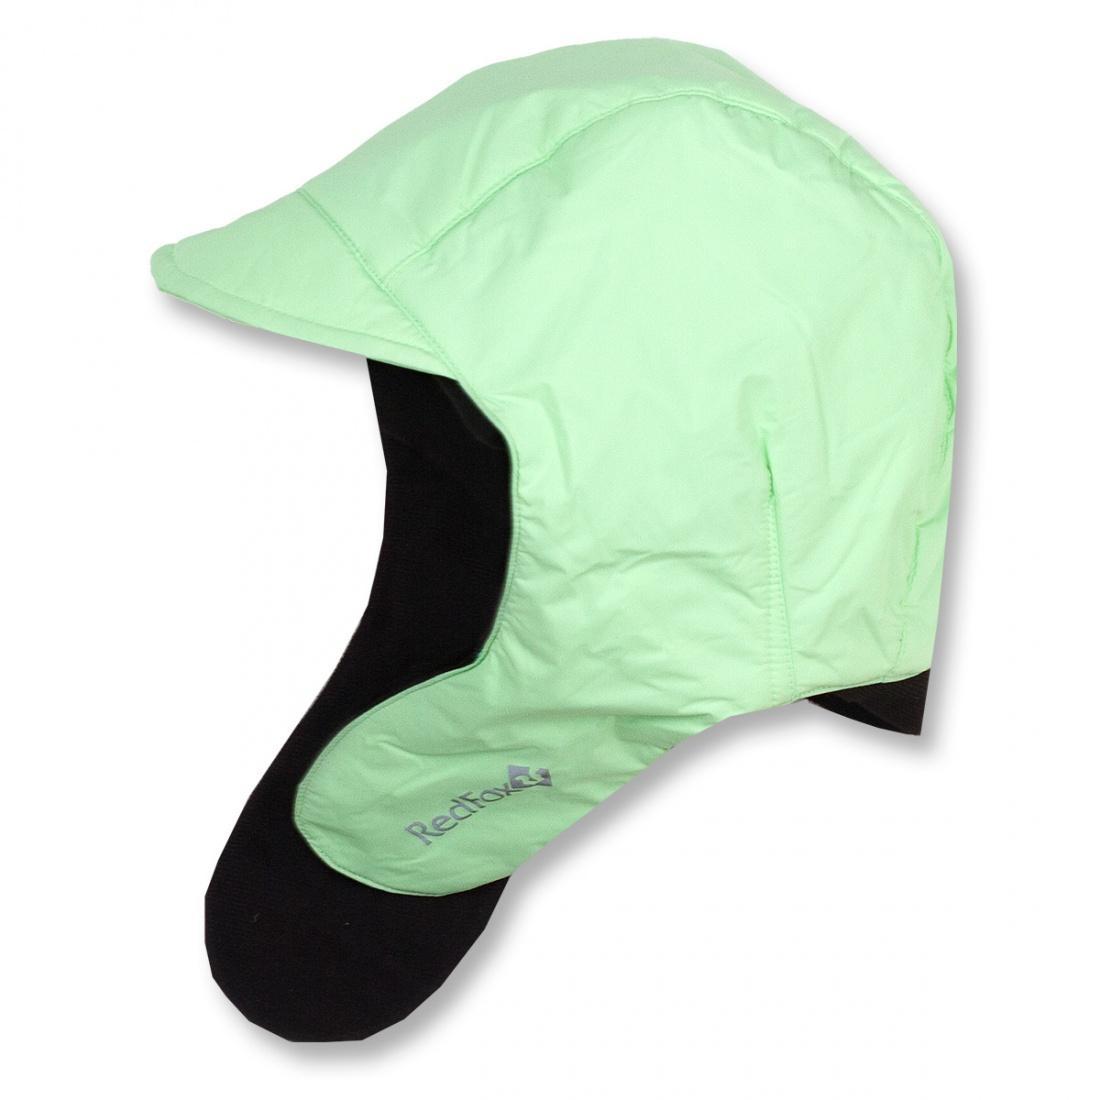 Шапка детская PilotУшанки<br><br> Удобная стильная шапочка для детей от года. <br><br> <br><br><br><br> Материал – Dry Factor 1000.<br><br> <br><br><br> Утеплитель – Omniterm Classic.<br><br> <br>&lt;...<br><br>Цвет: Светло-зеленый<br>Размер: XXL